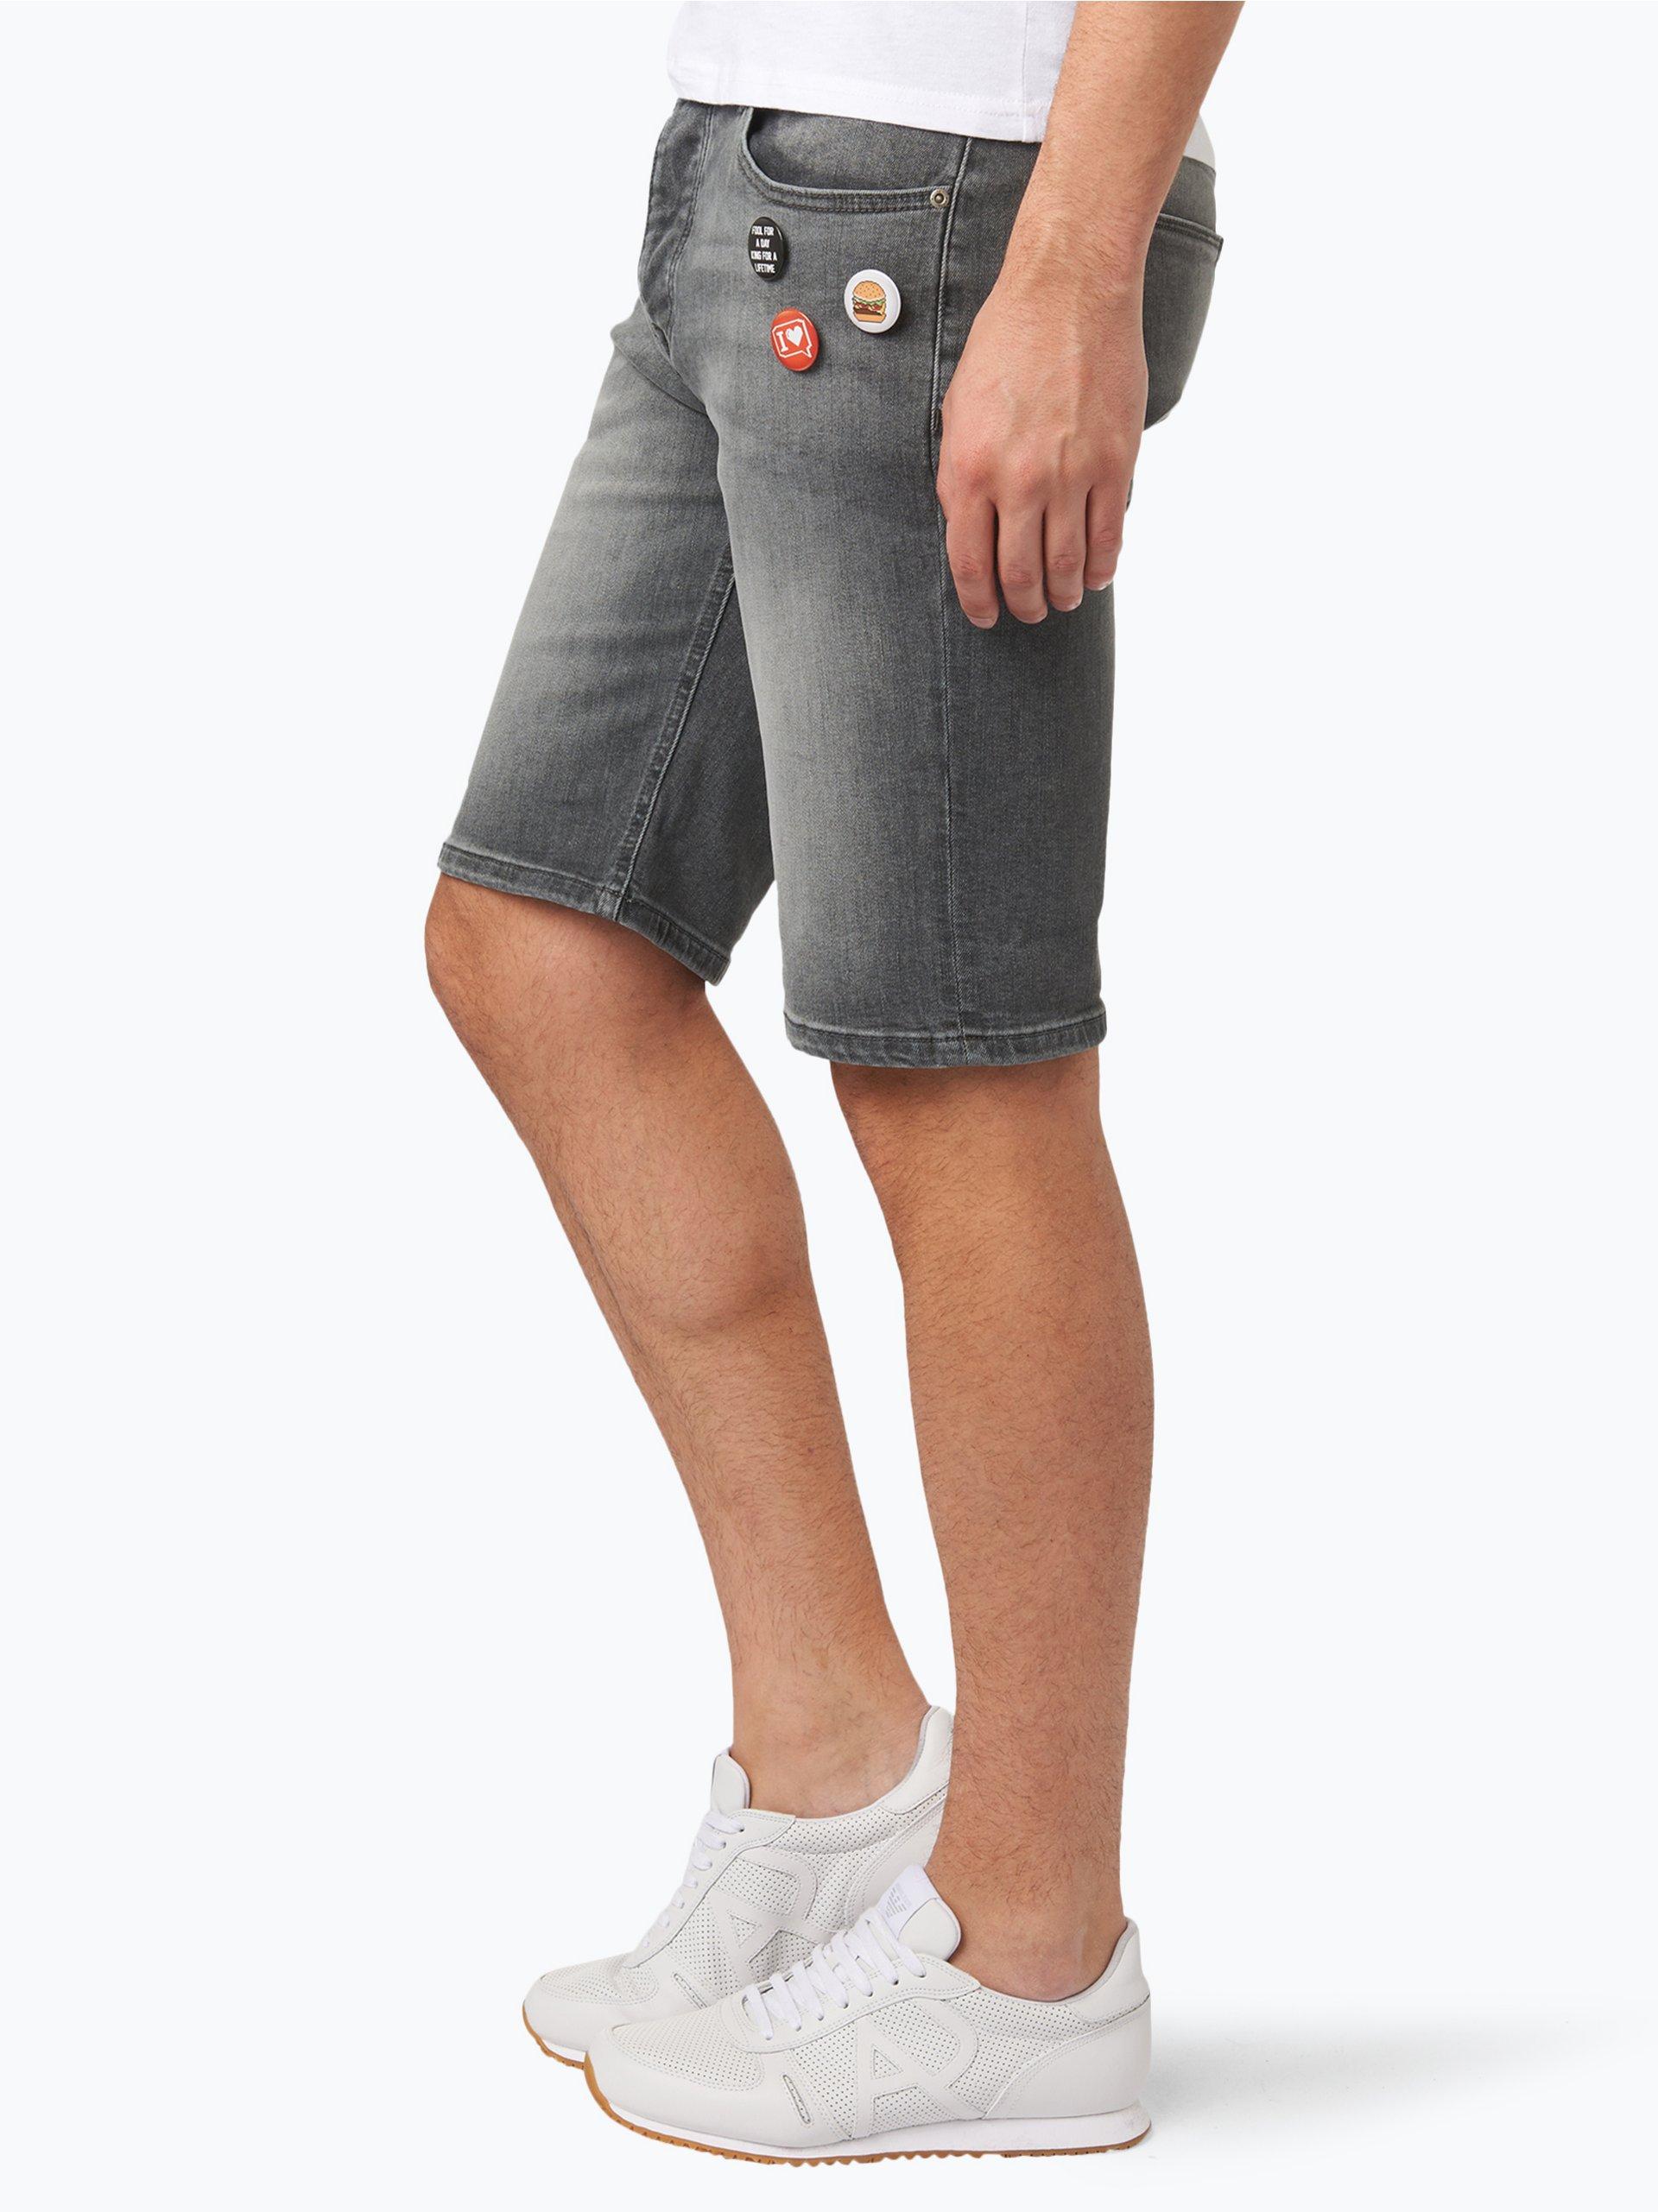 review herren jeans bermuda grau uni online kaufen. Black Bedroom Furniture Sets. Home Design Ideas